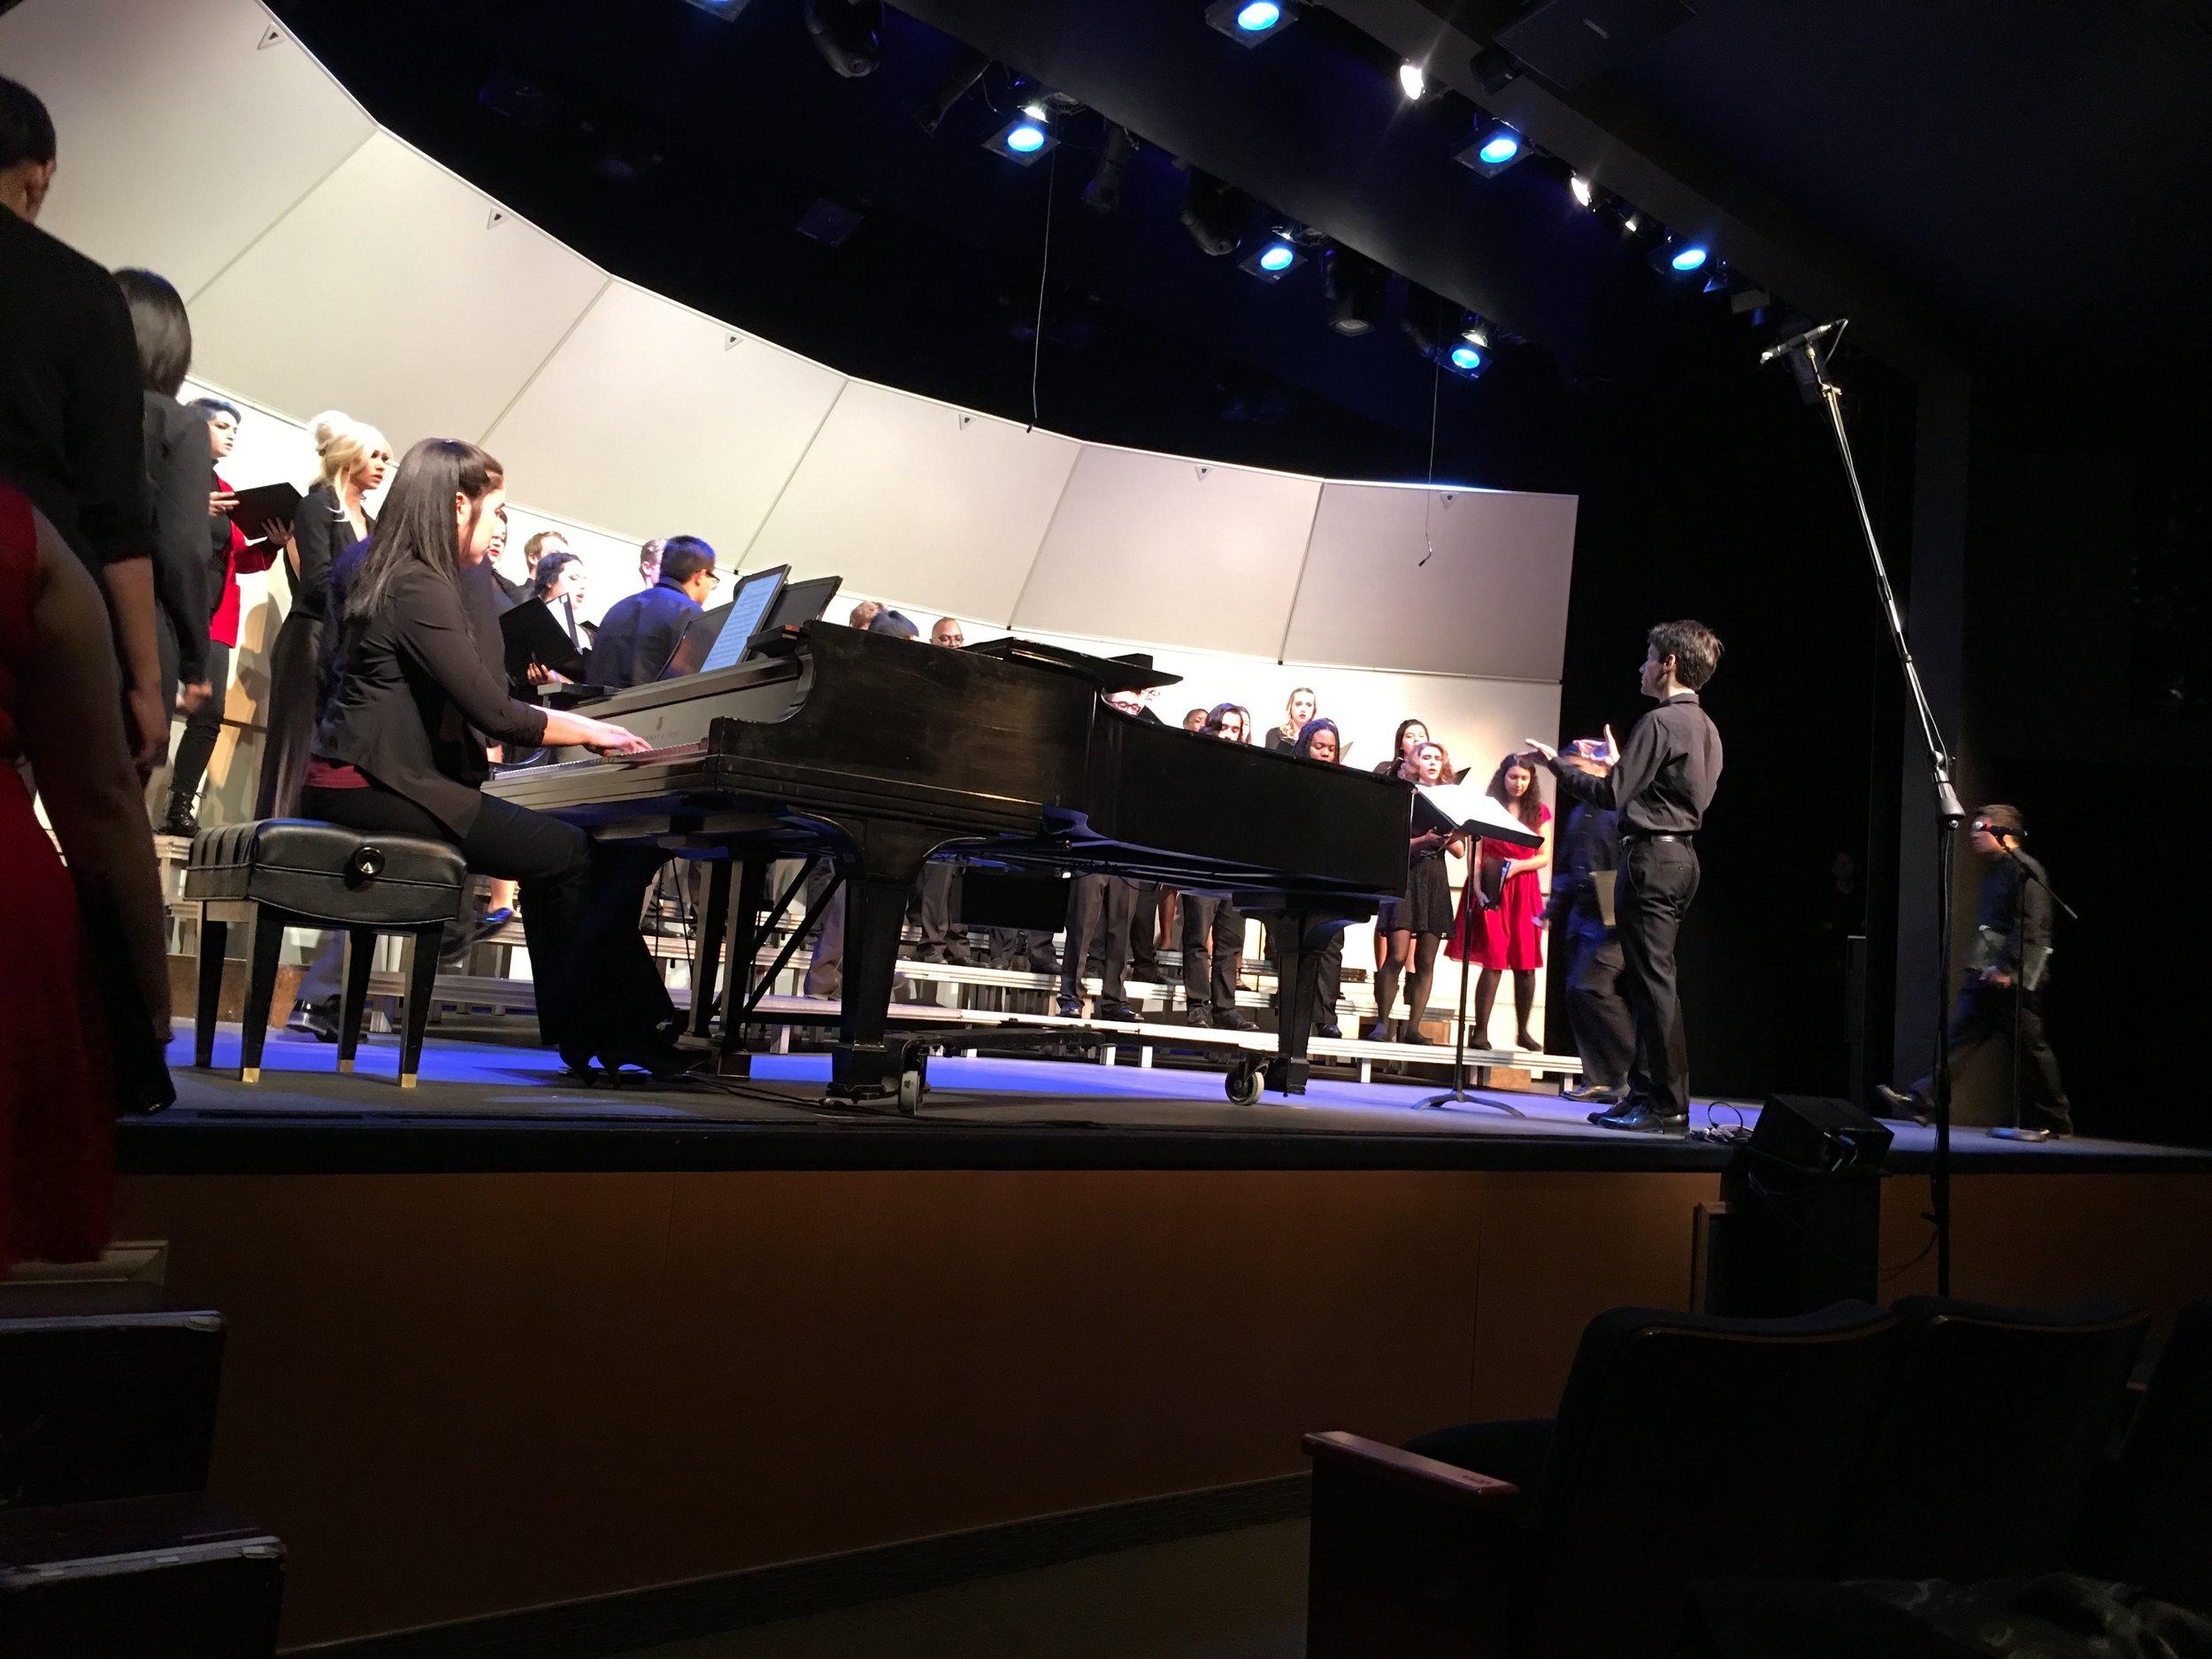 Professor David Rentz conducts the Chaffey College Choir. Photo by Sabino Villanueva.